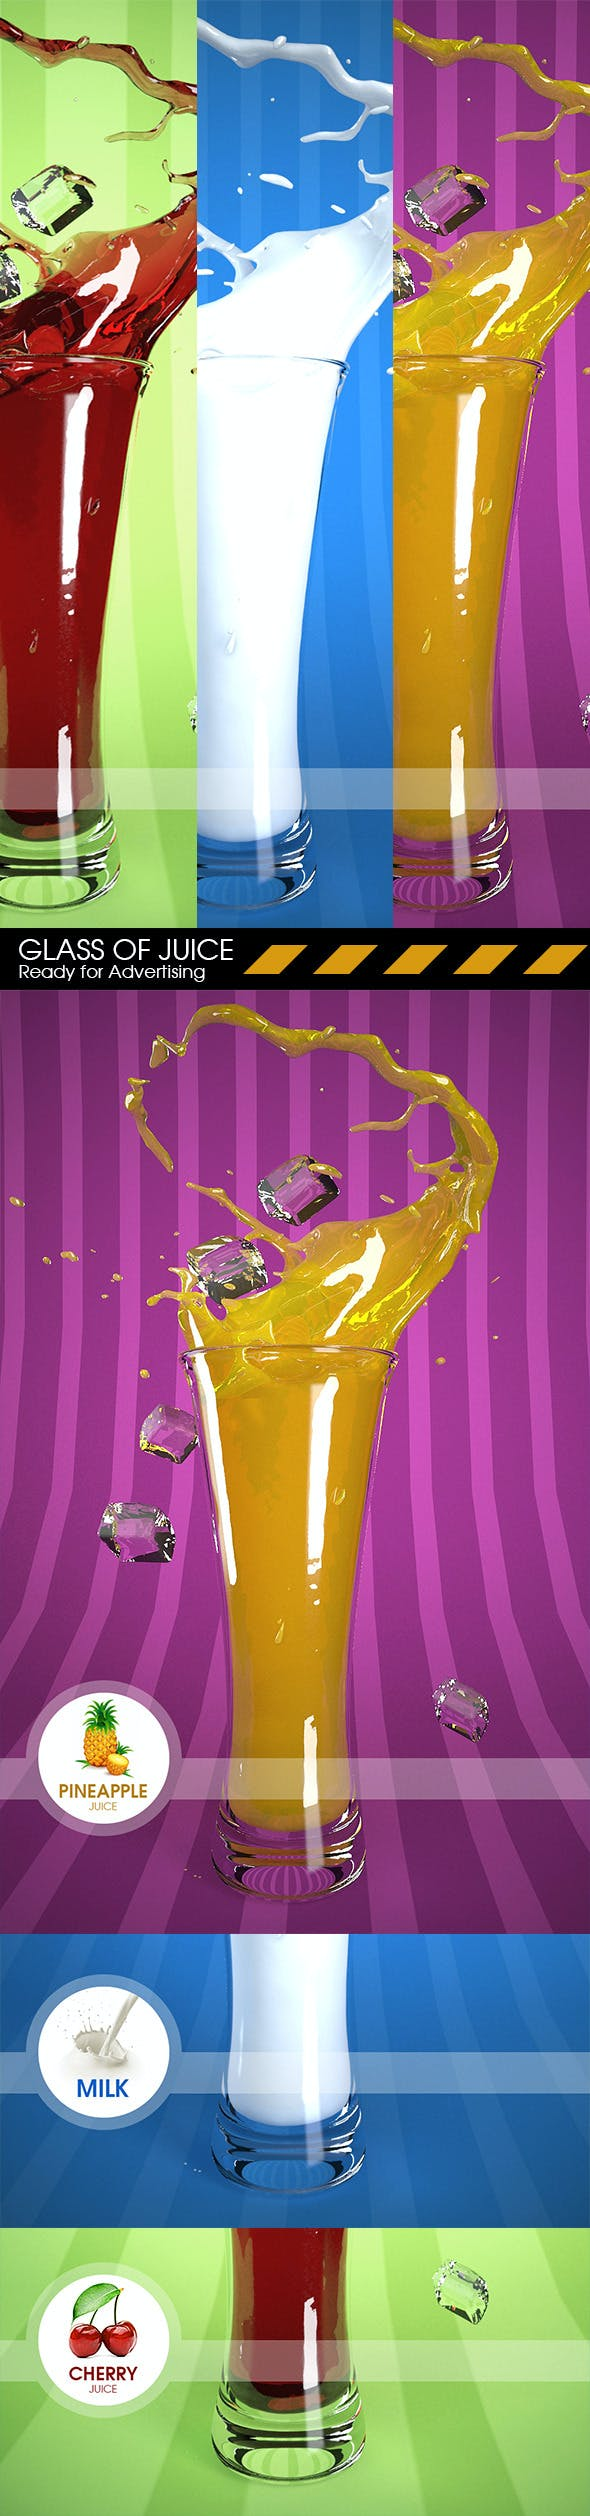 Splashing Juice - 3DOcean Item for Sale